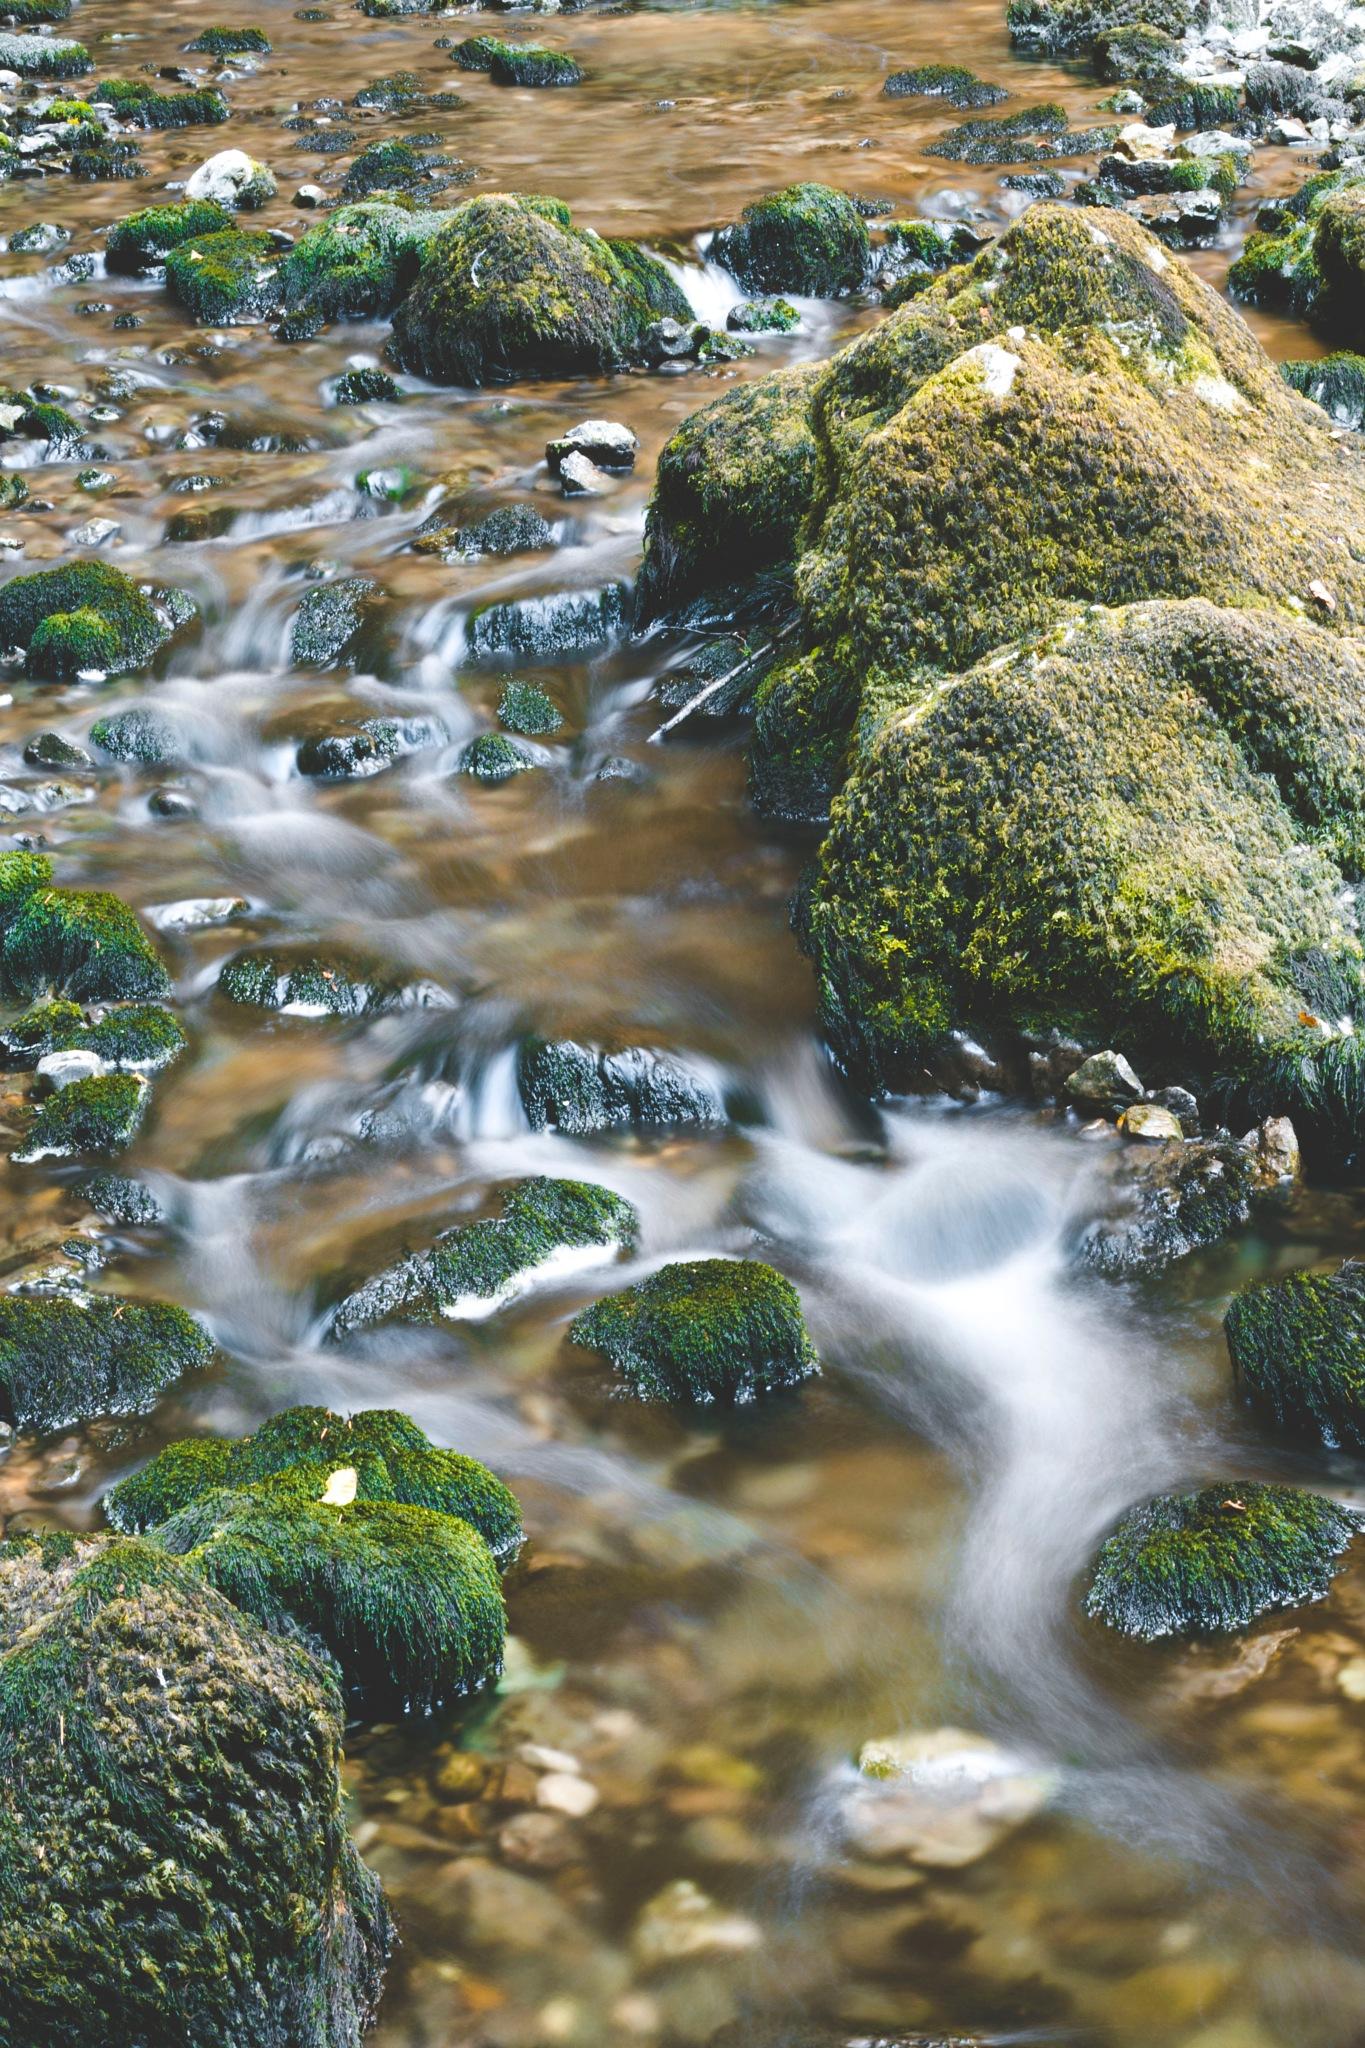 Stream of life by Karin Kebe